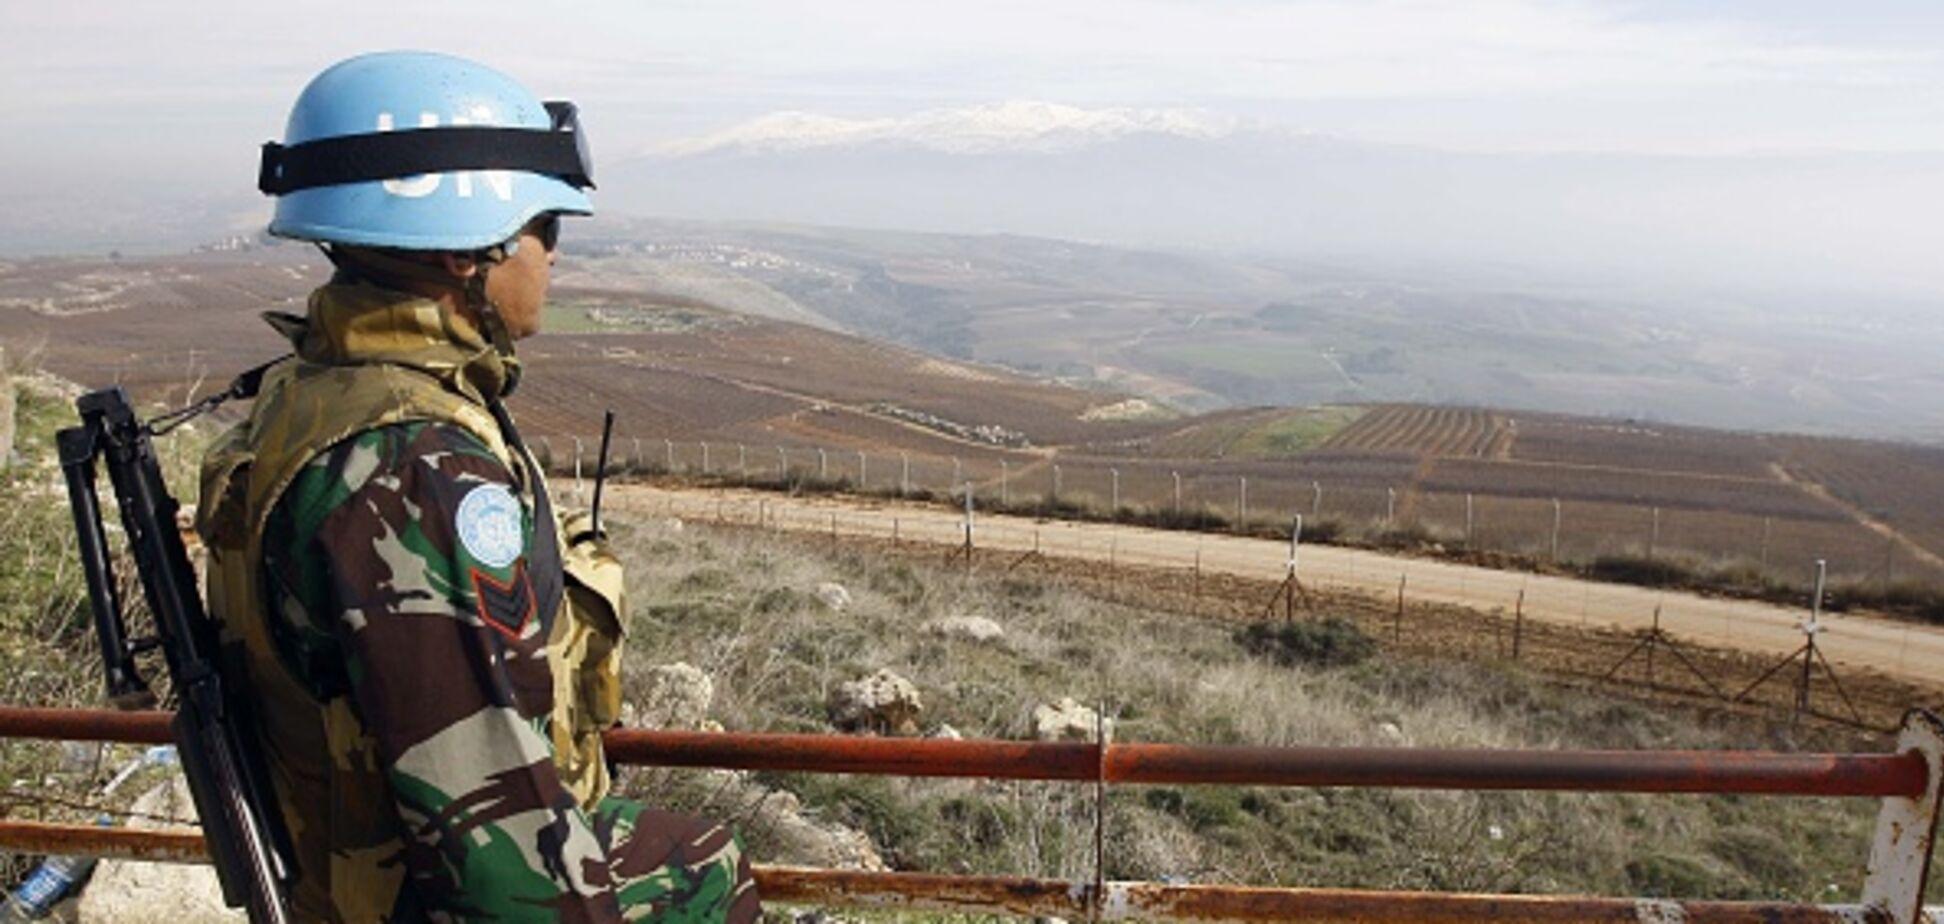 В ЕС отреагировали на инициативу Путина о миротворцах на Донбассе